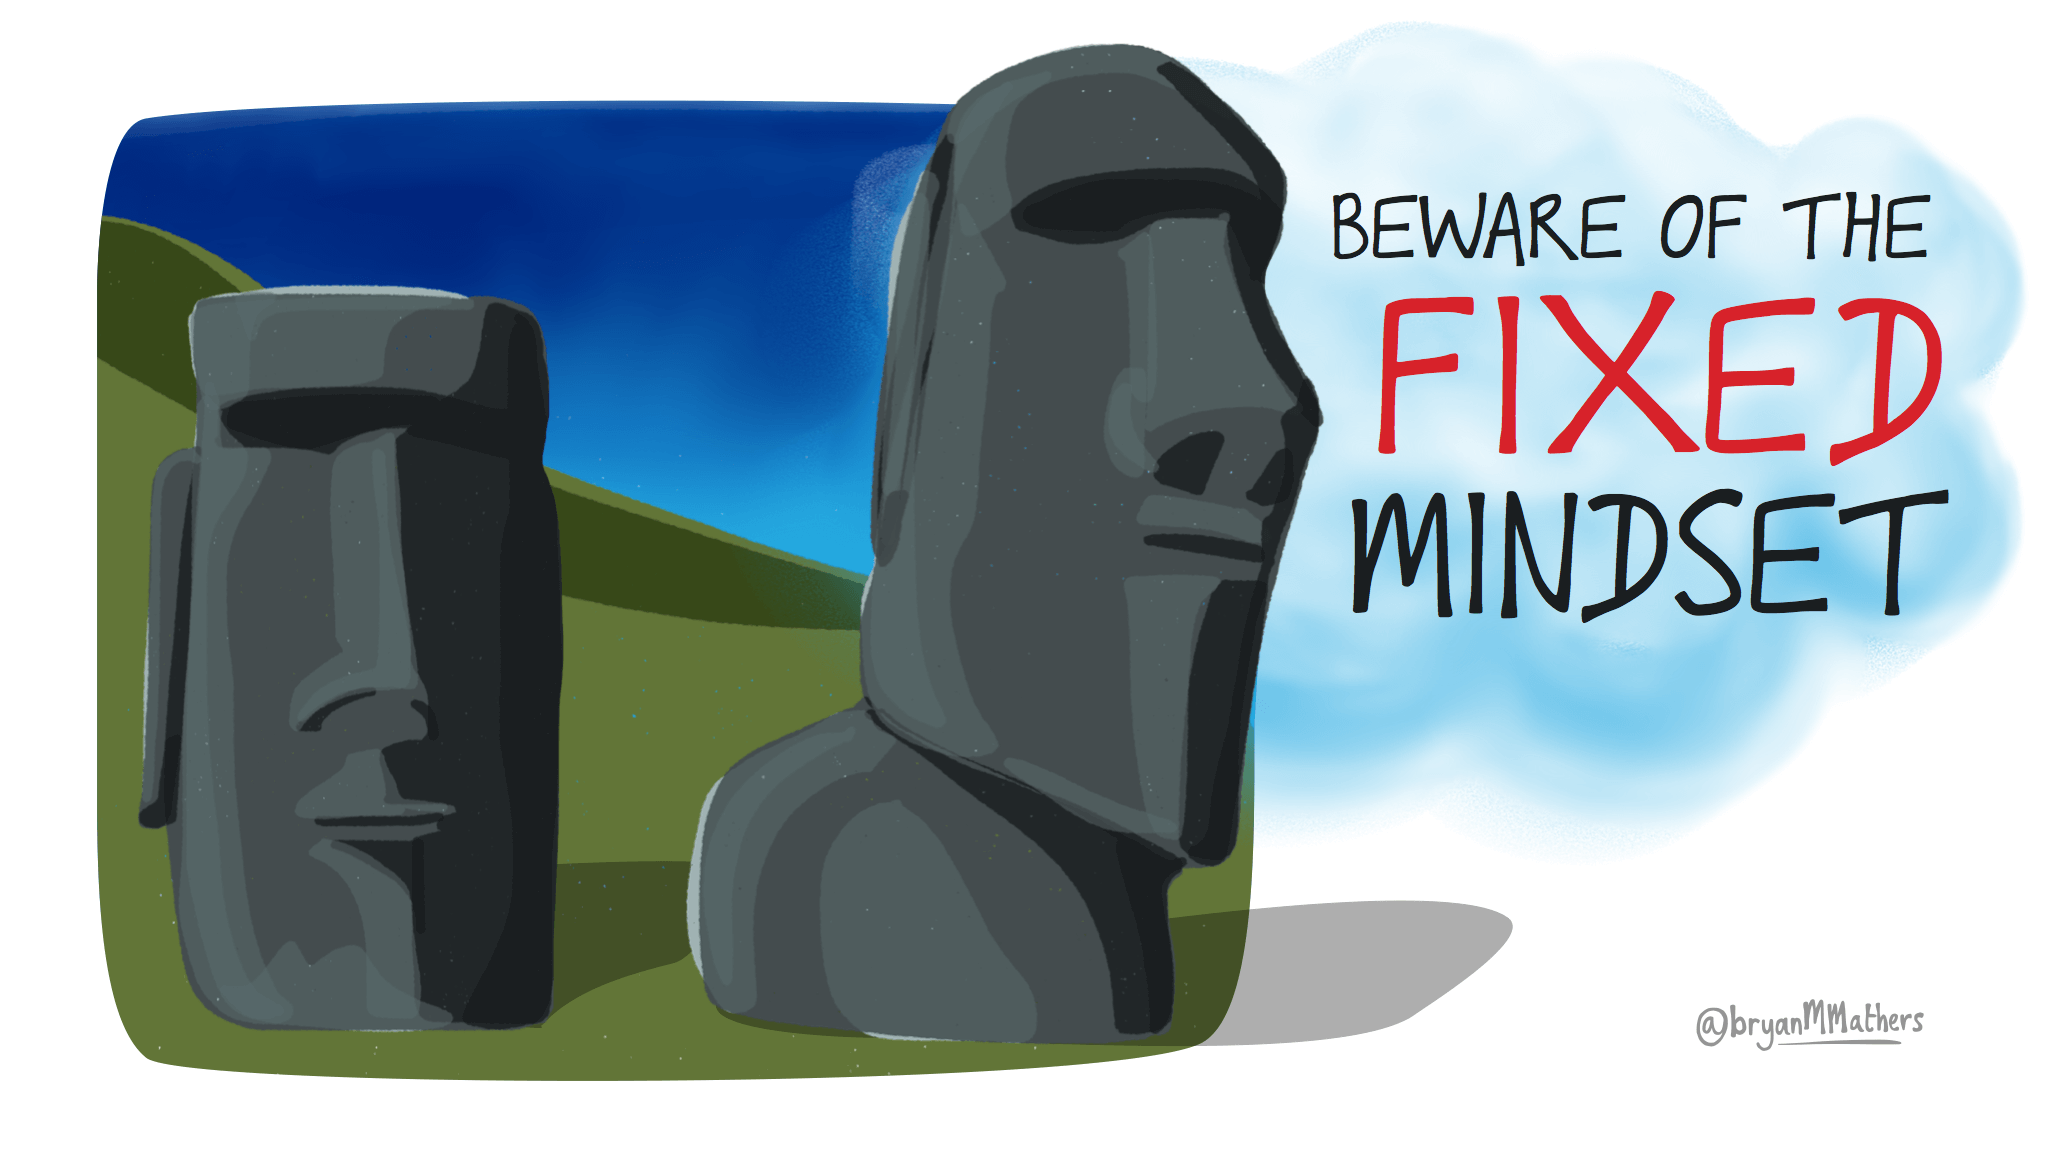 Fixed Mindsets